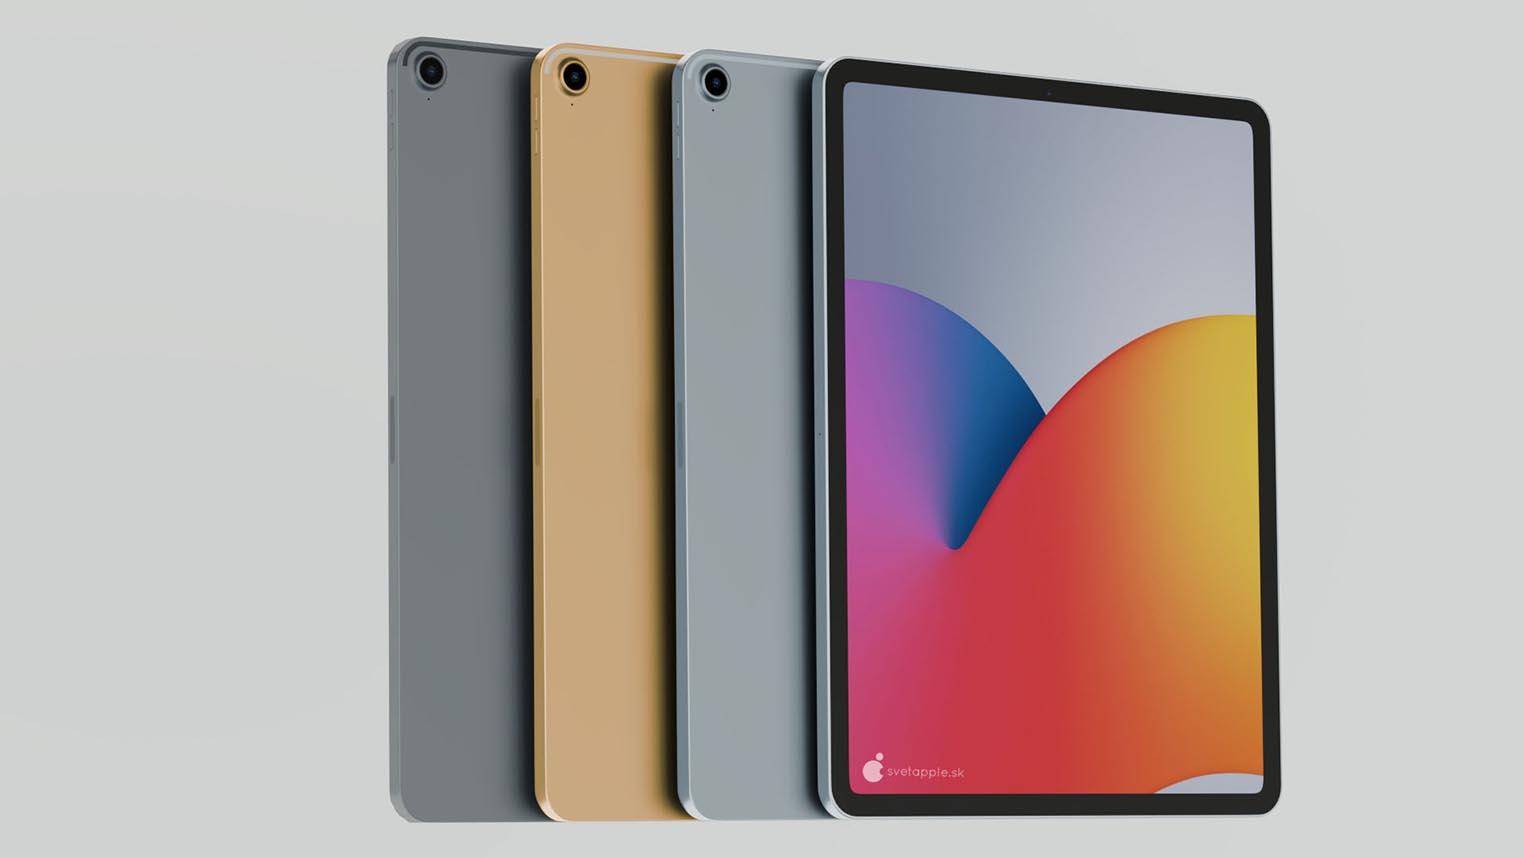 Concept iPad Air 4